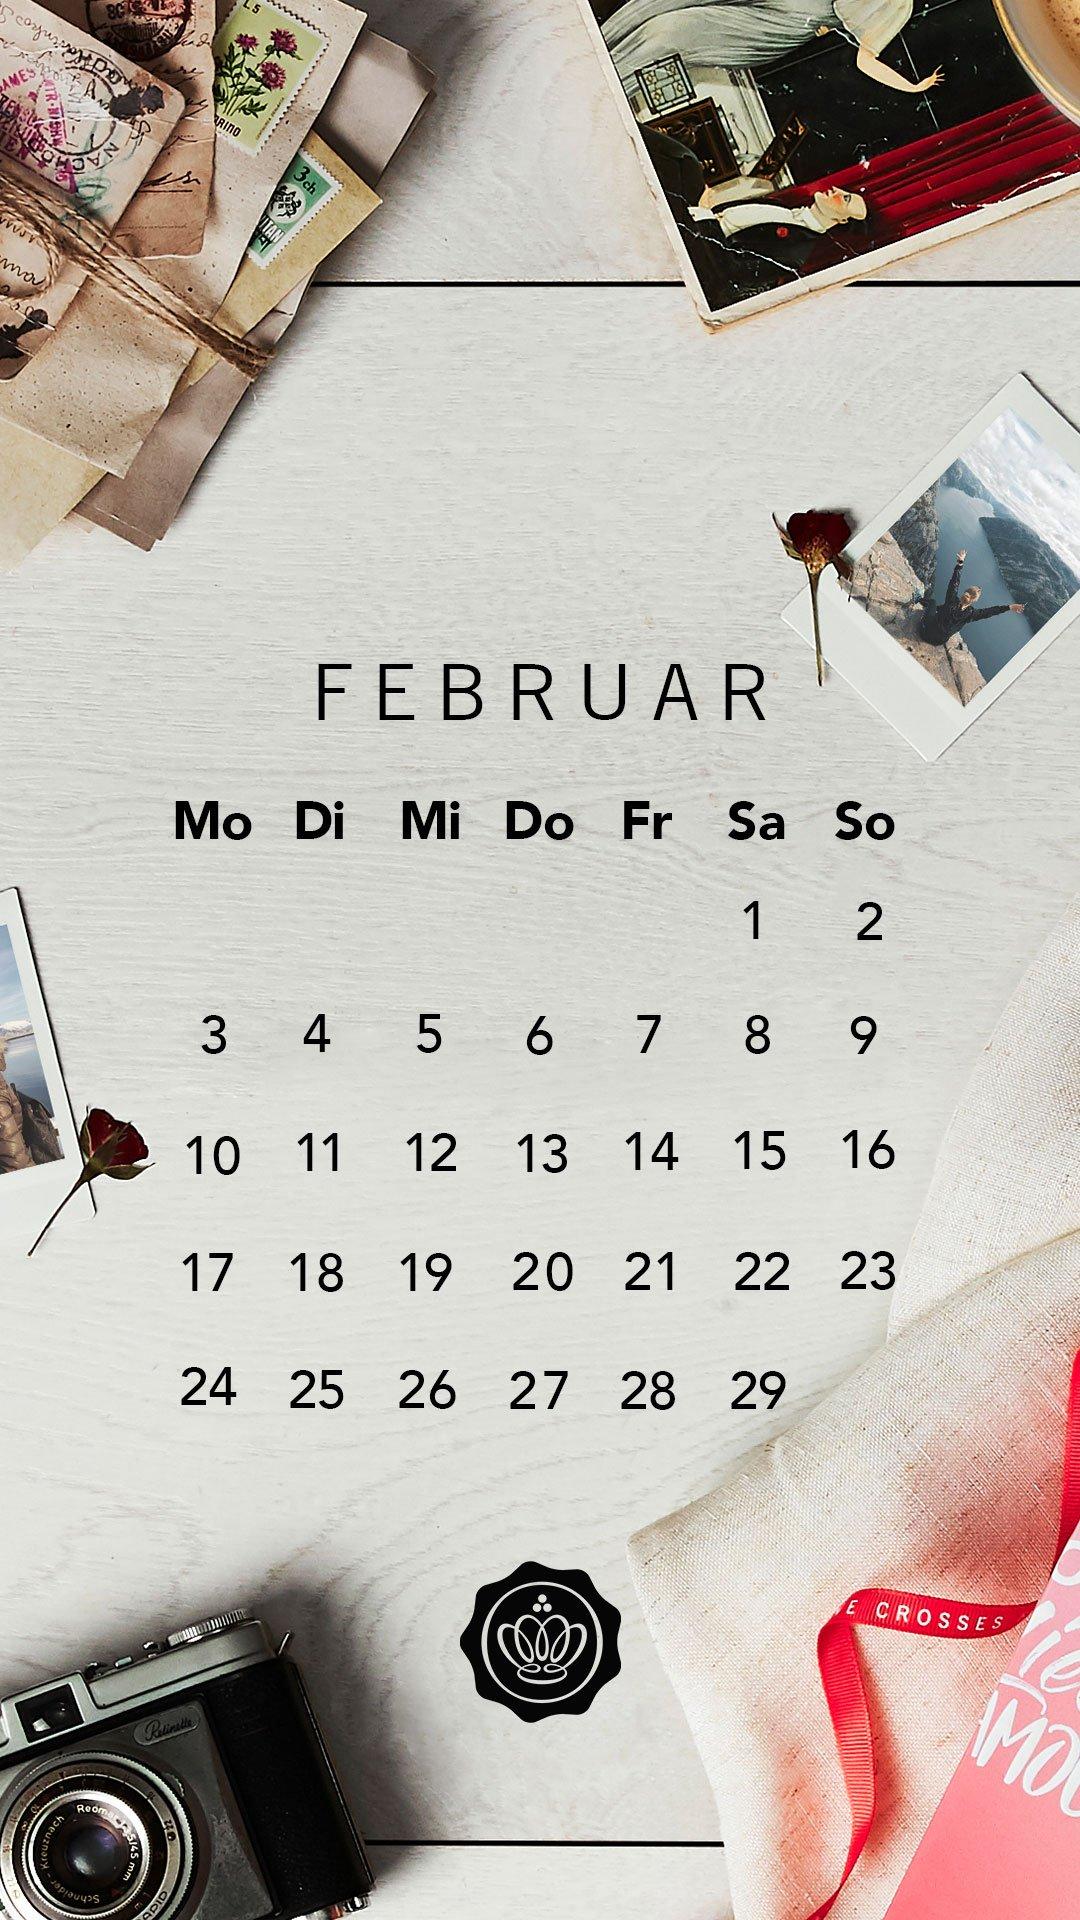 GLOSSYBOX-wallpaper-februar-2020-smartphone